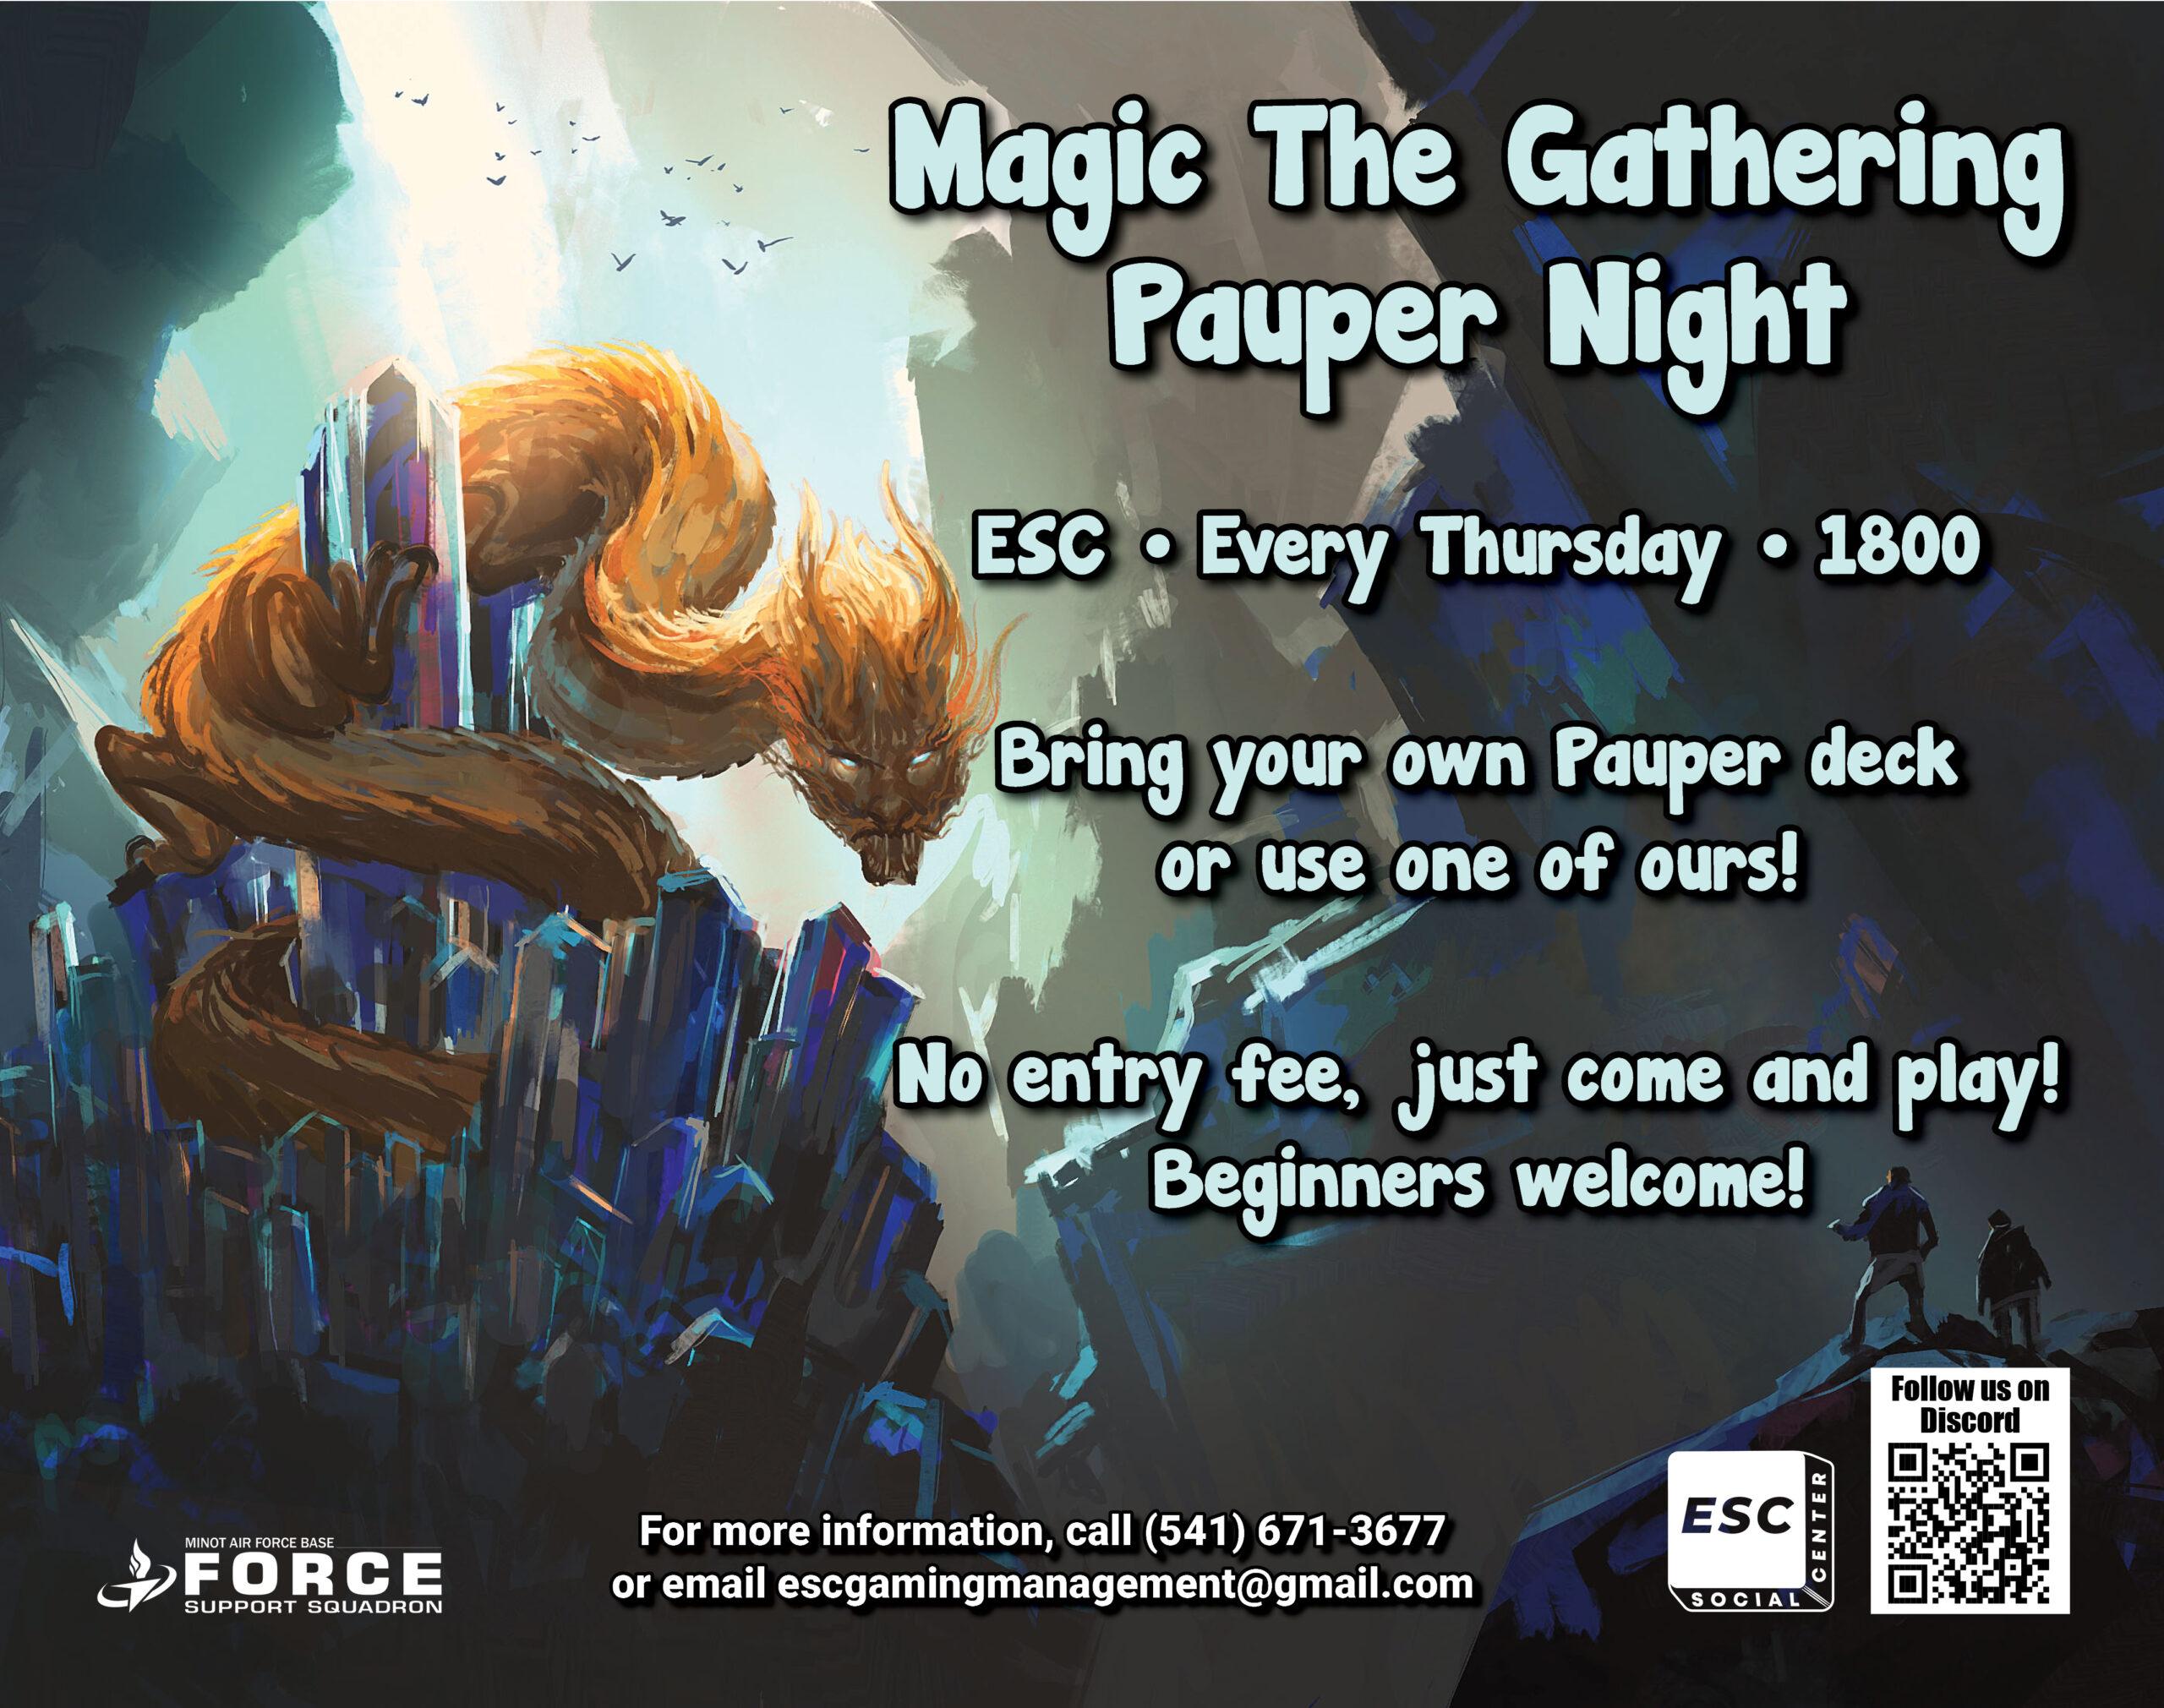 Magic The Gathering Pauper Night